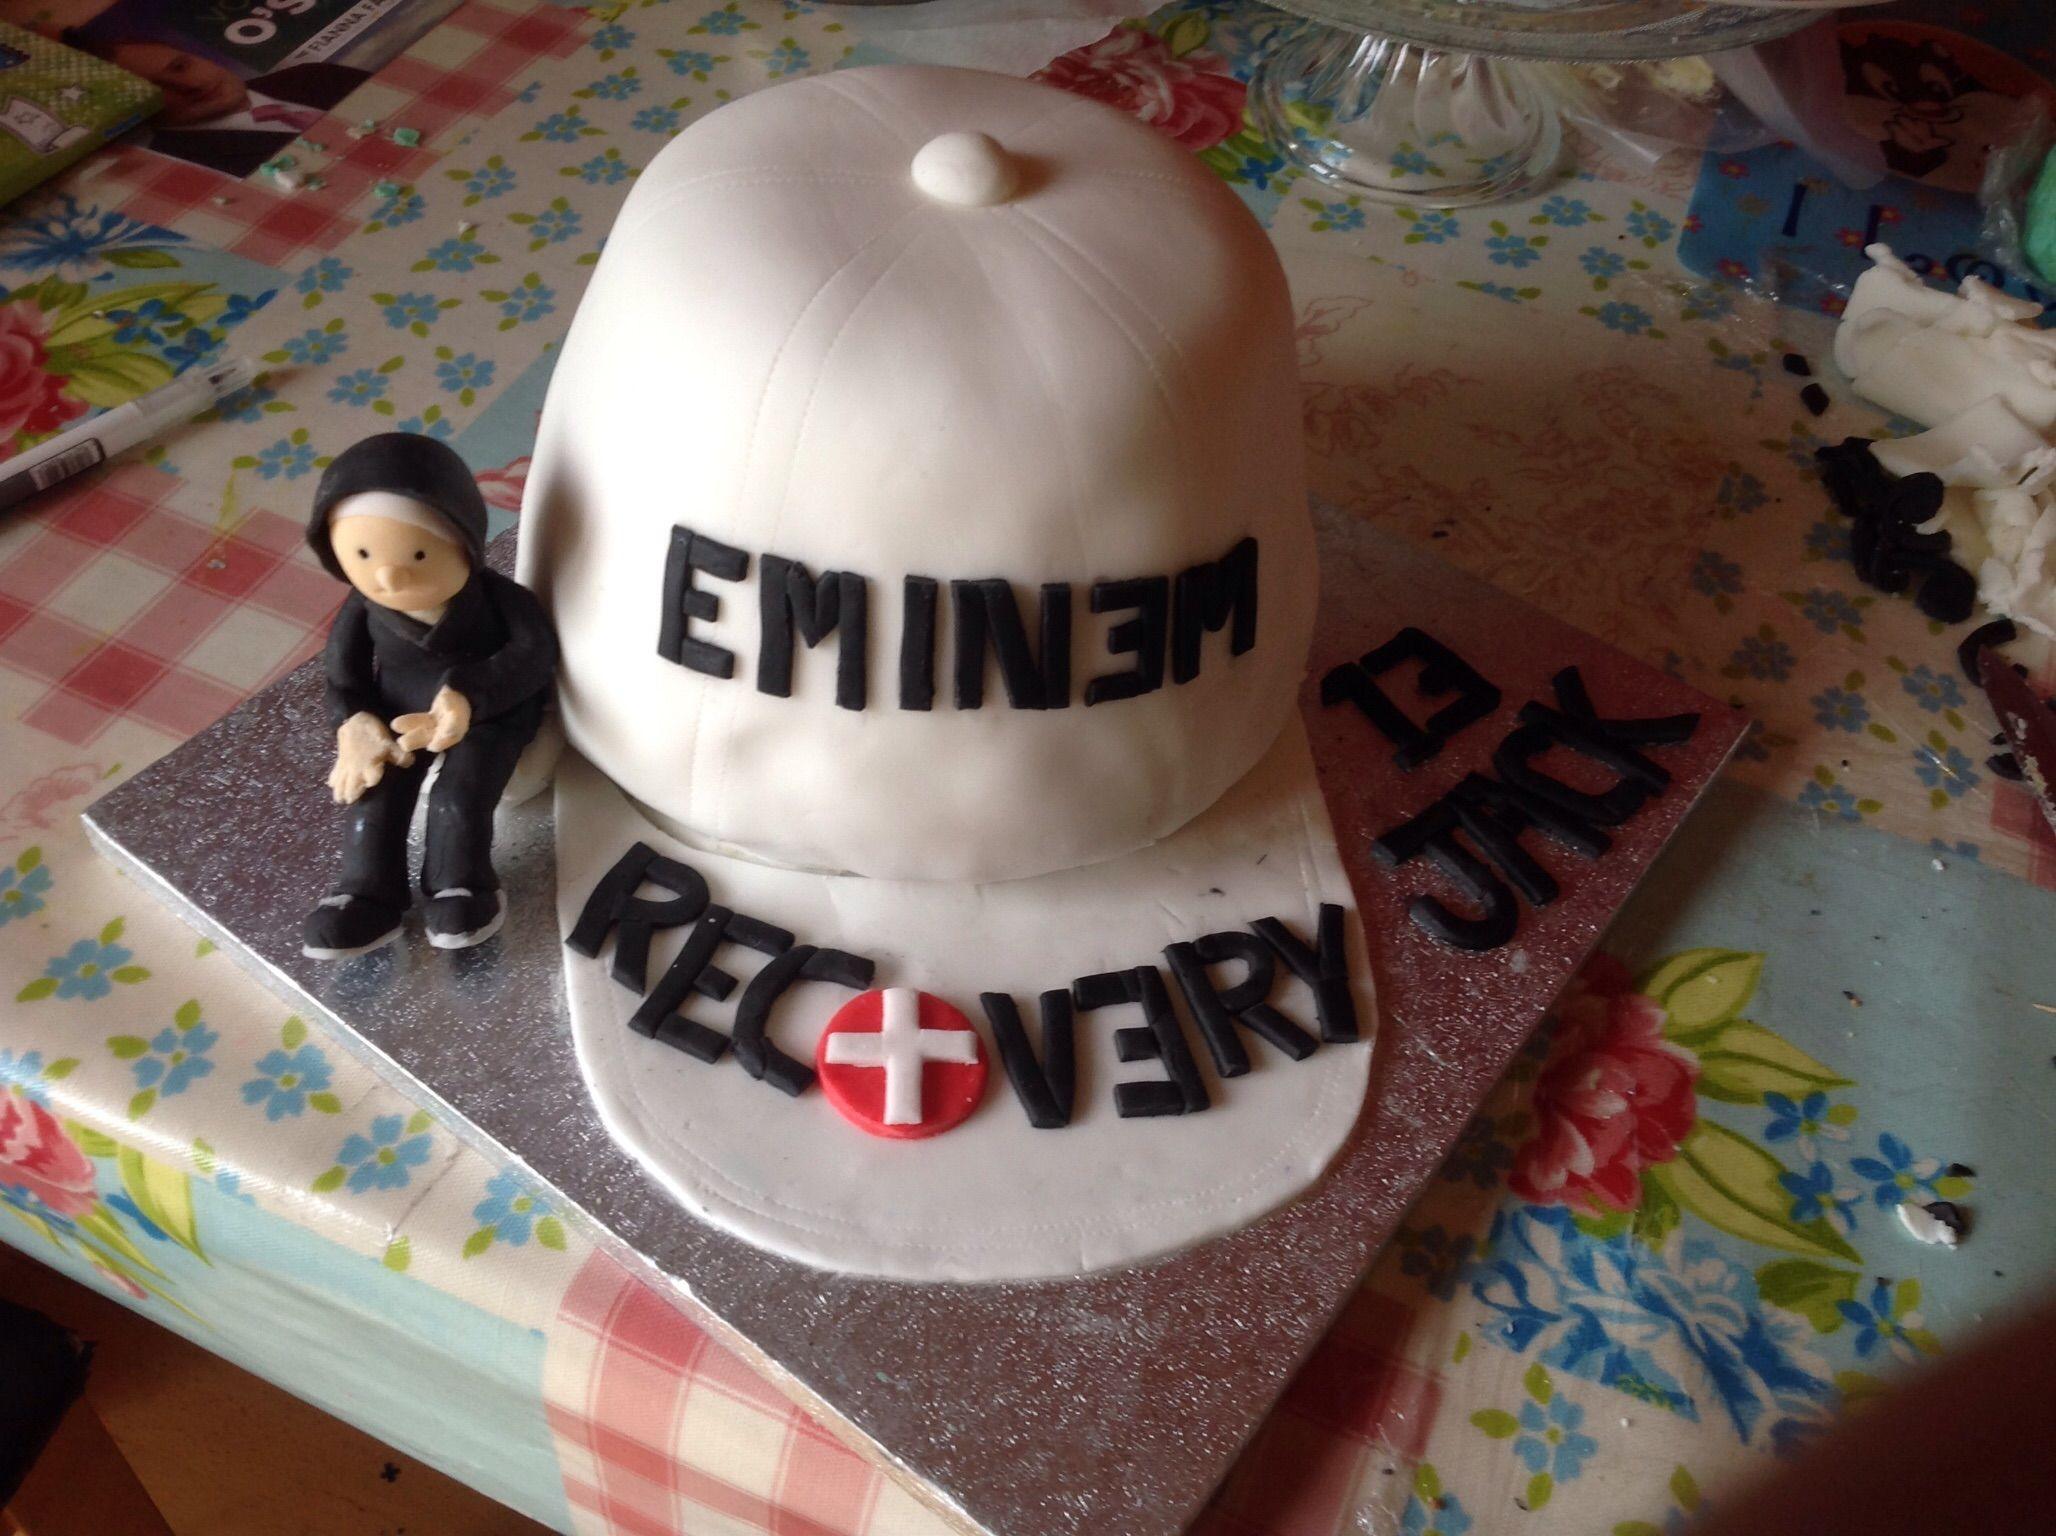 Awesome Eminem Cake Eminem Birthday Nigella Cakes Cake Funny Birthday Cards Online Bapapcheapnameinfo